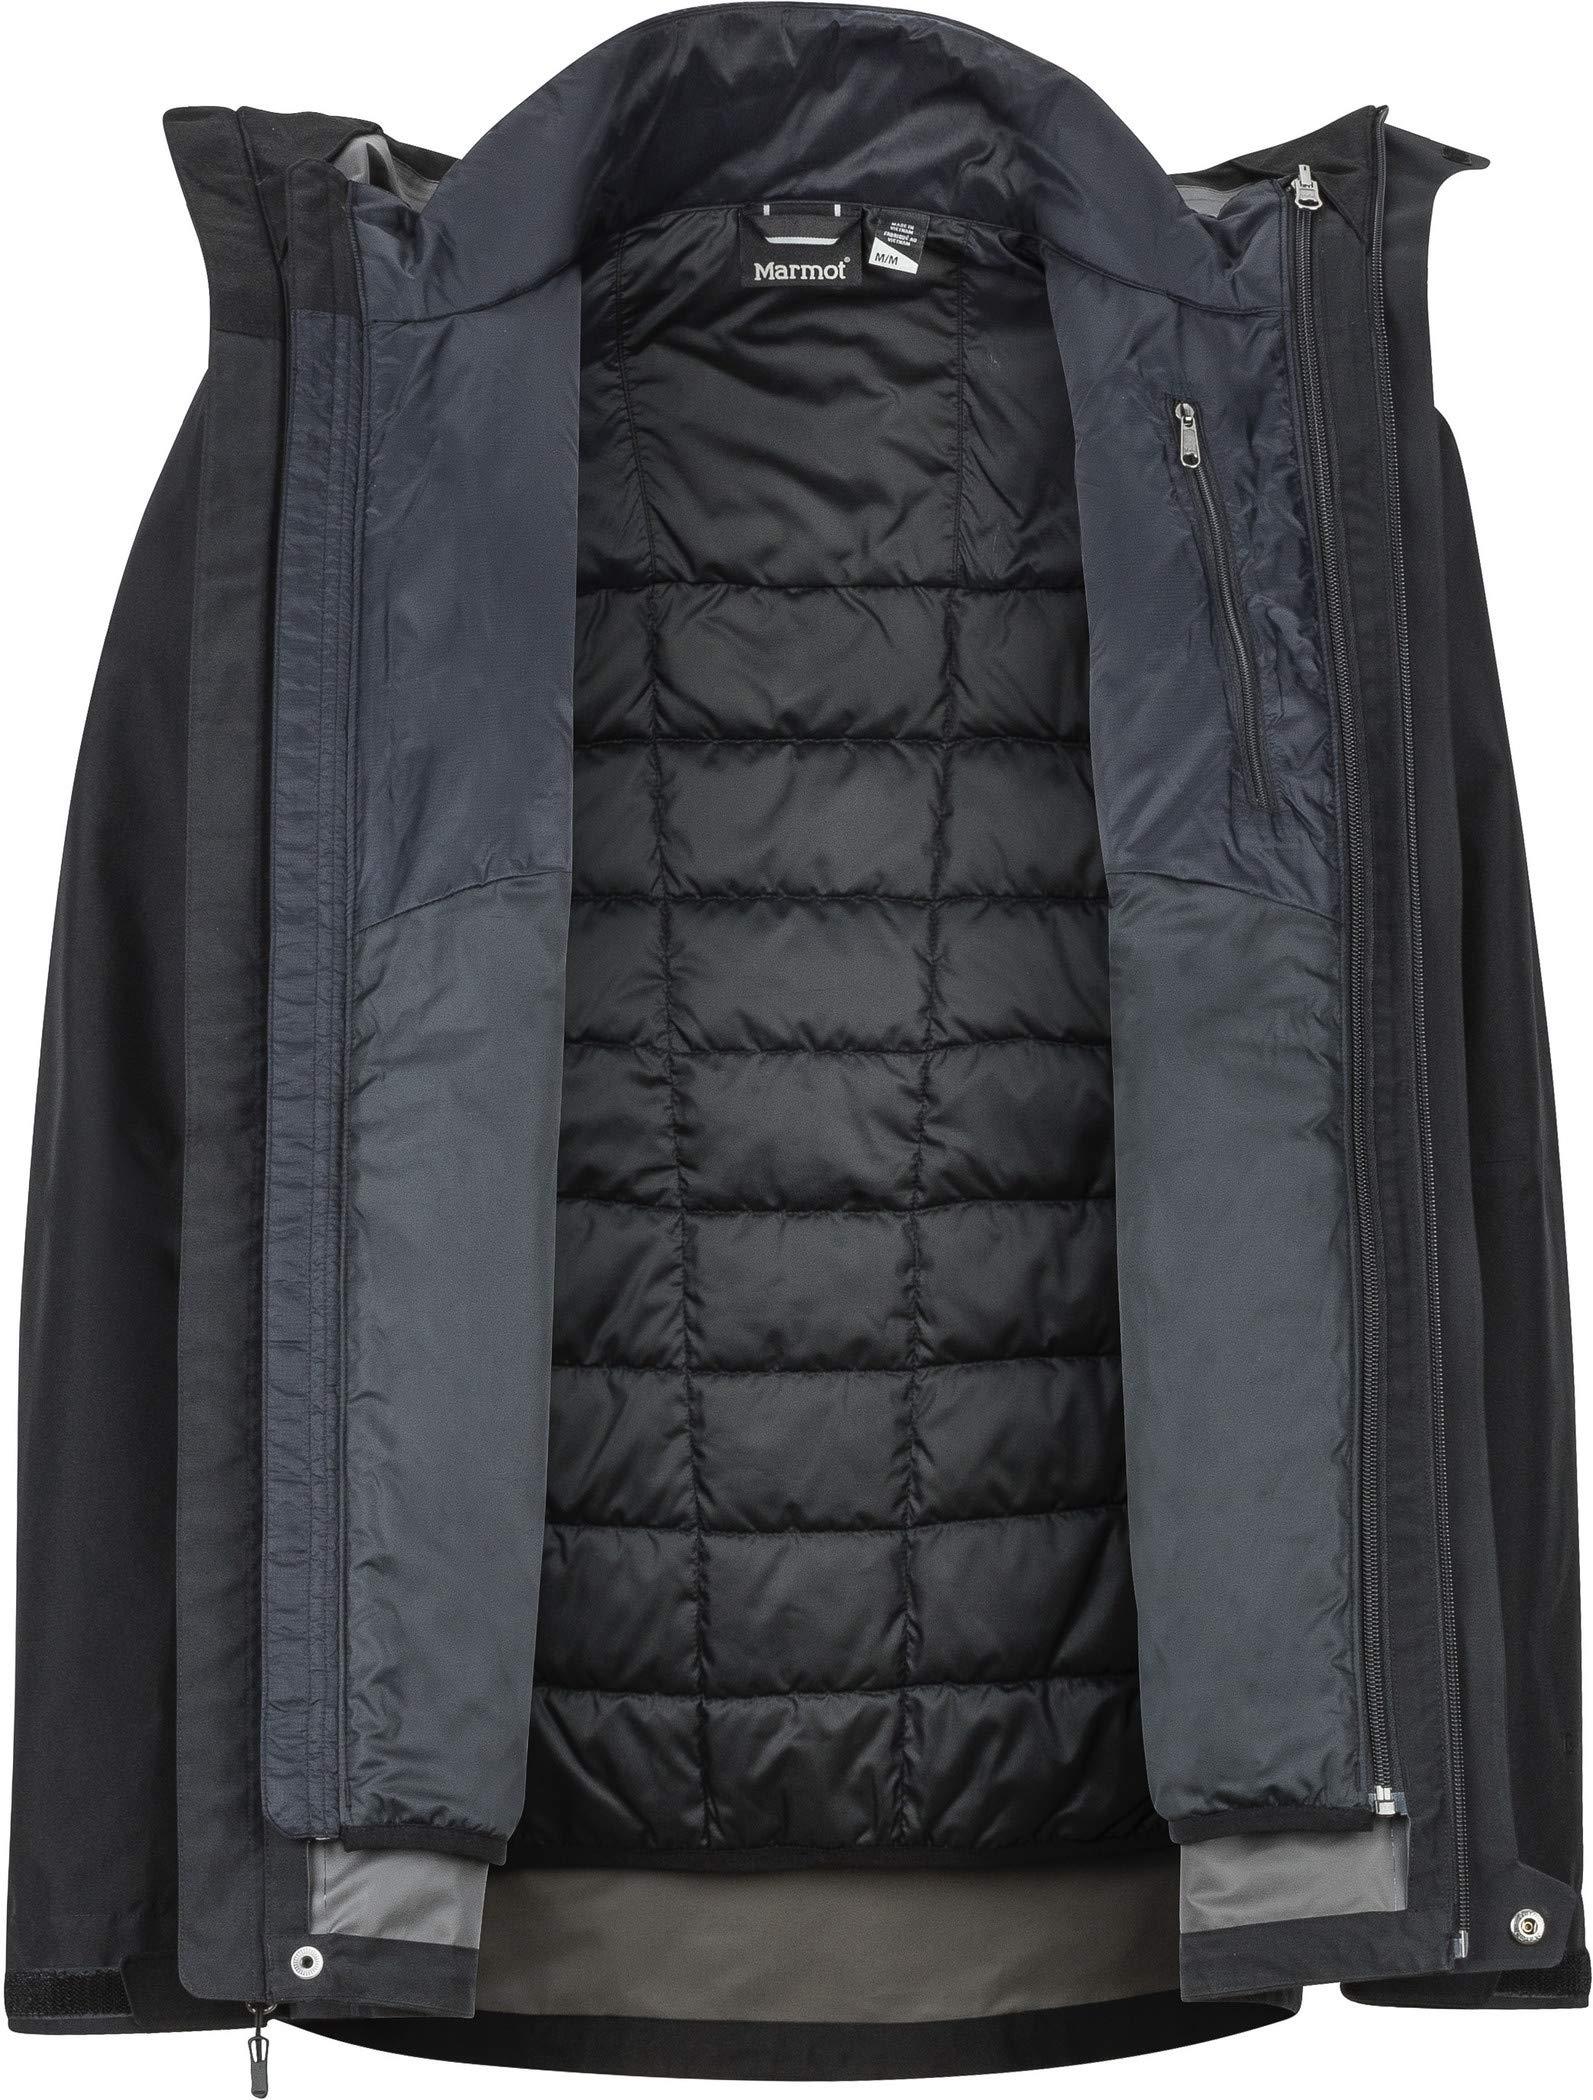 81XcTIYFbBL - Marmot Children's Minimalist Component' Jacket